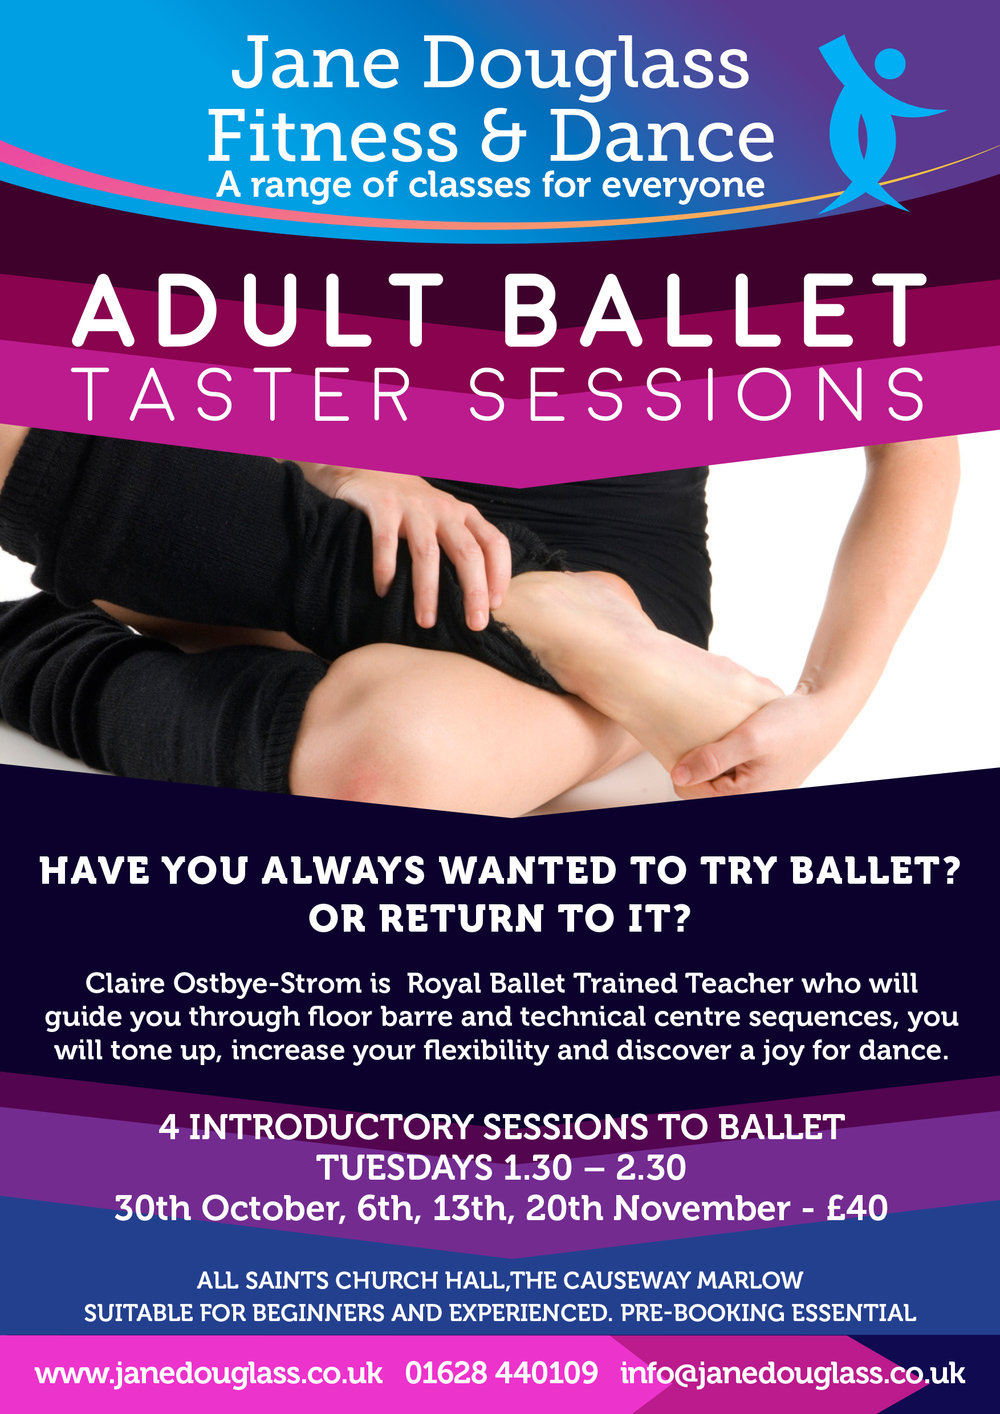 Adult Ballet tasters october 2018.jpg